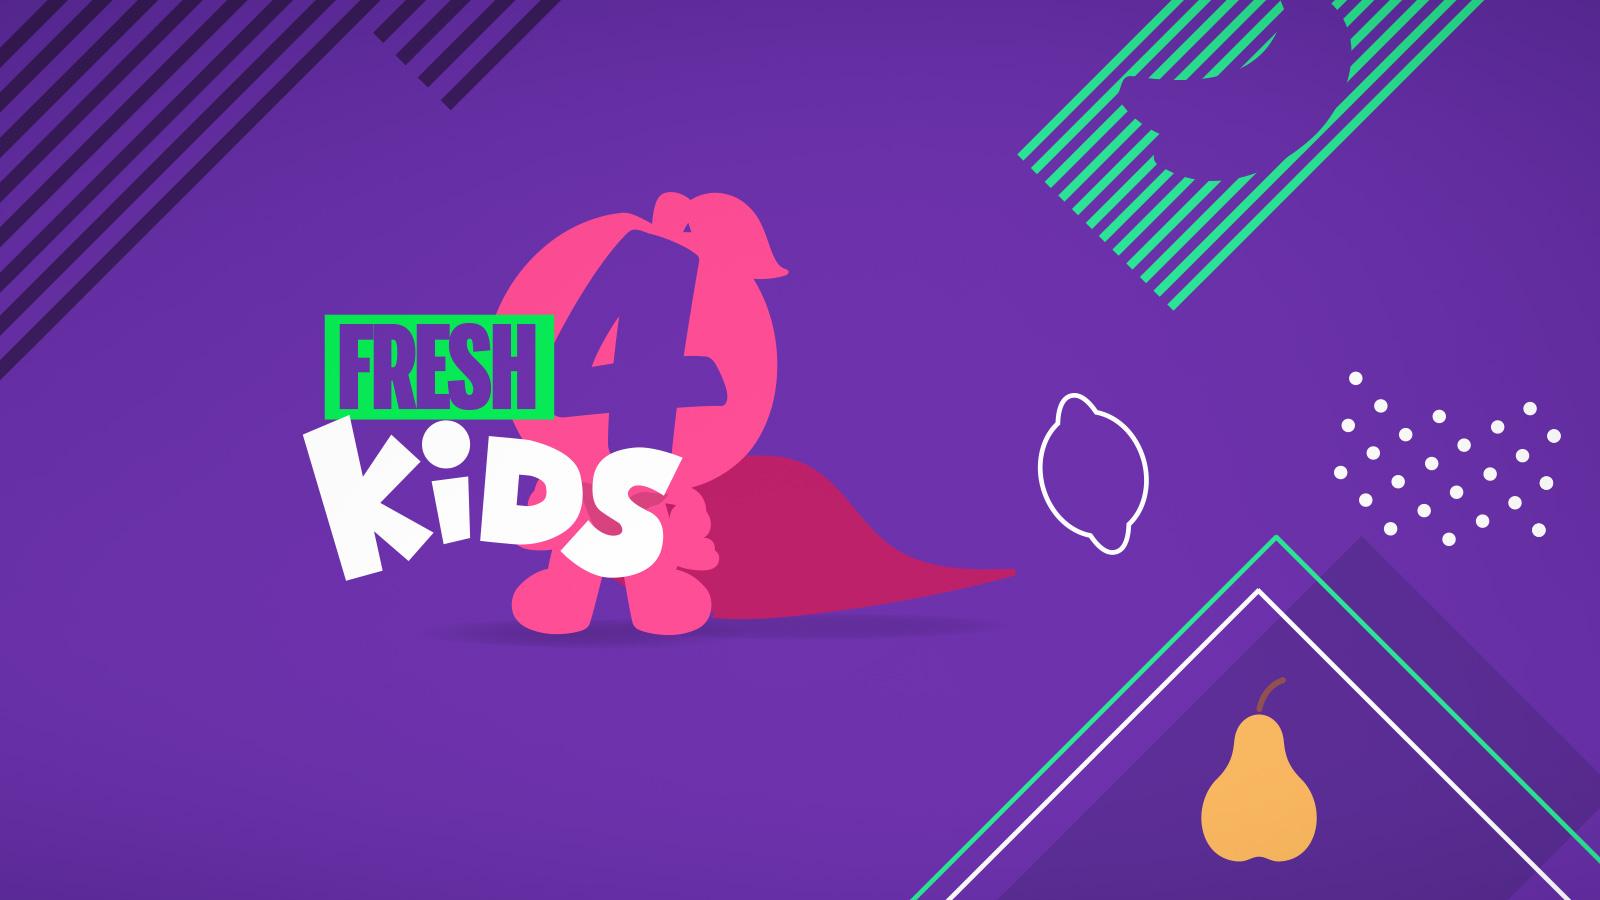 Fresh 4 Kids